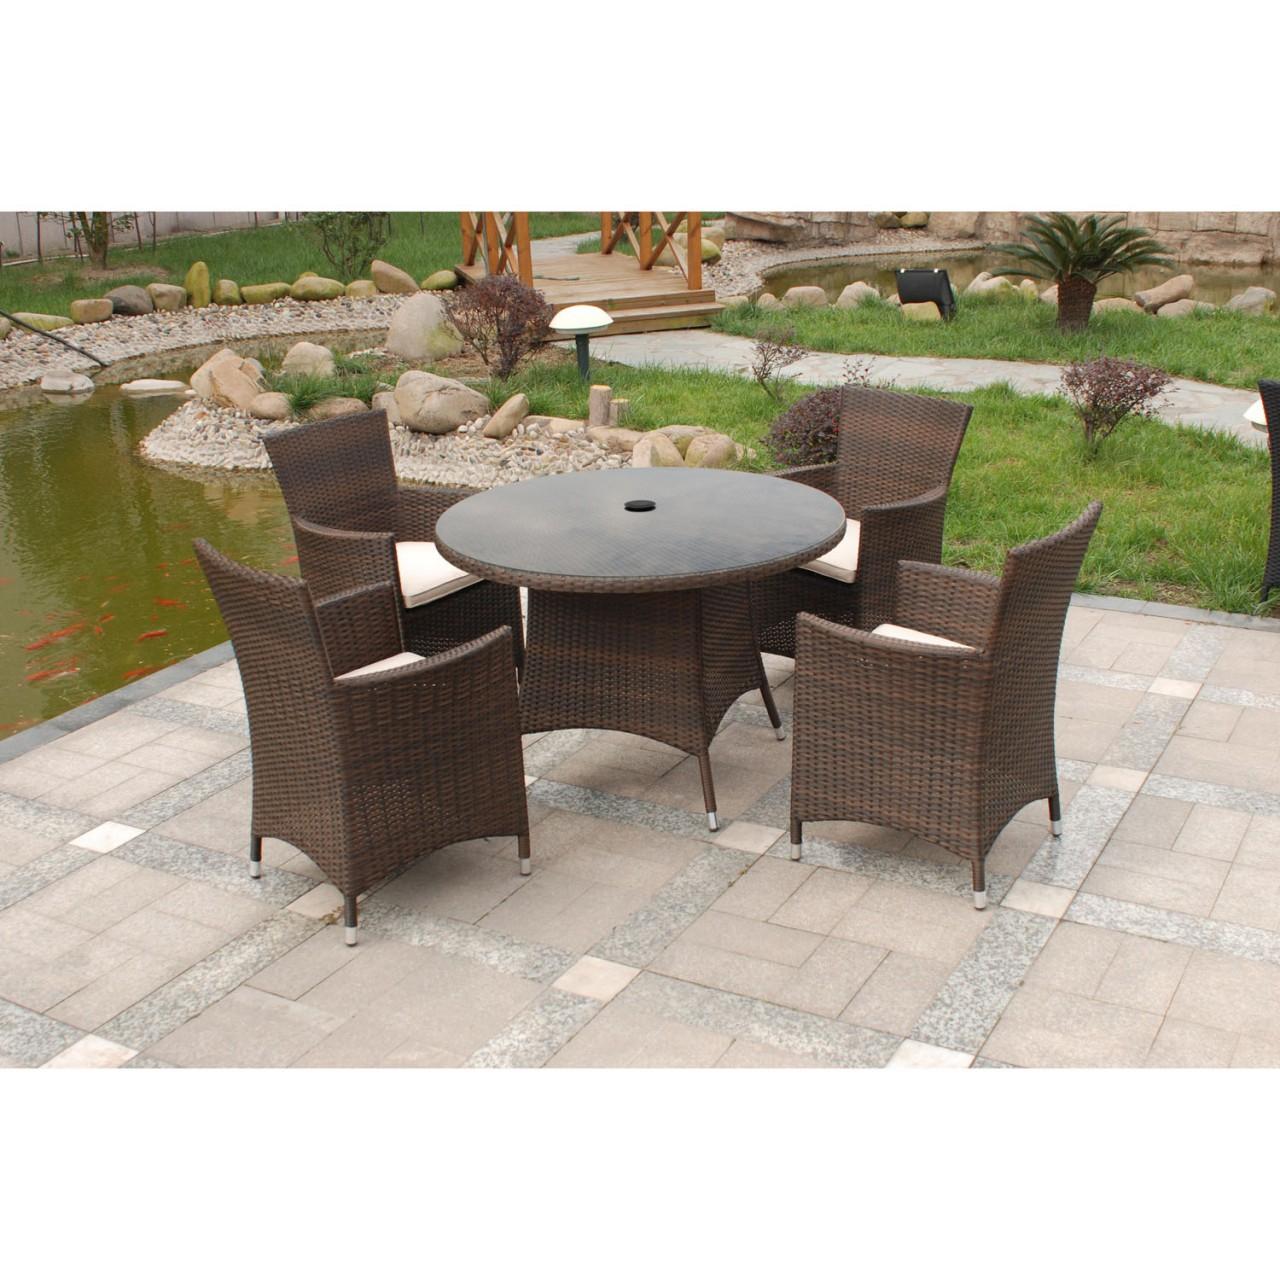 Plastic Rattan Garden Furniture Cozy Outdoor Wicker Patio pertaining to size 1280 X 1280